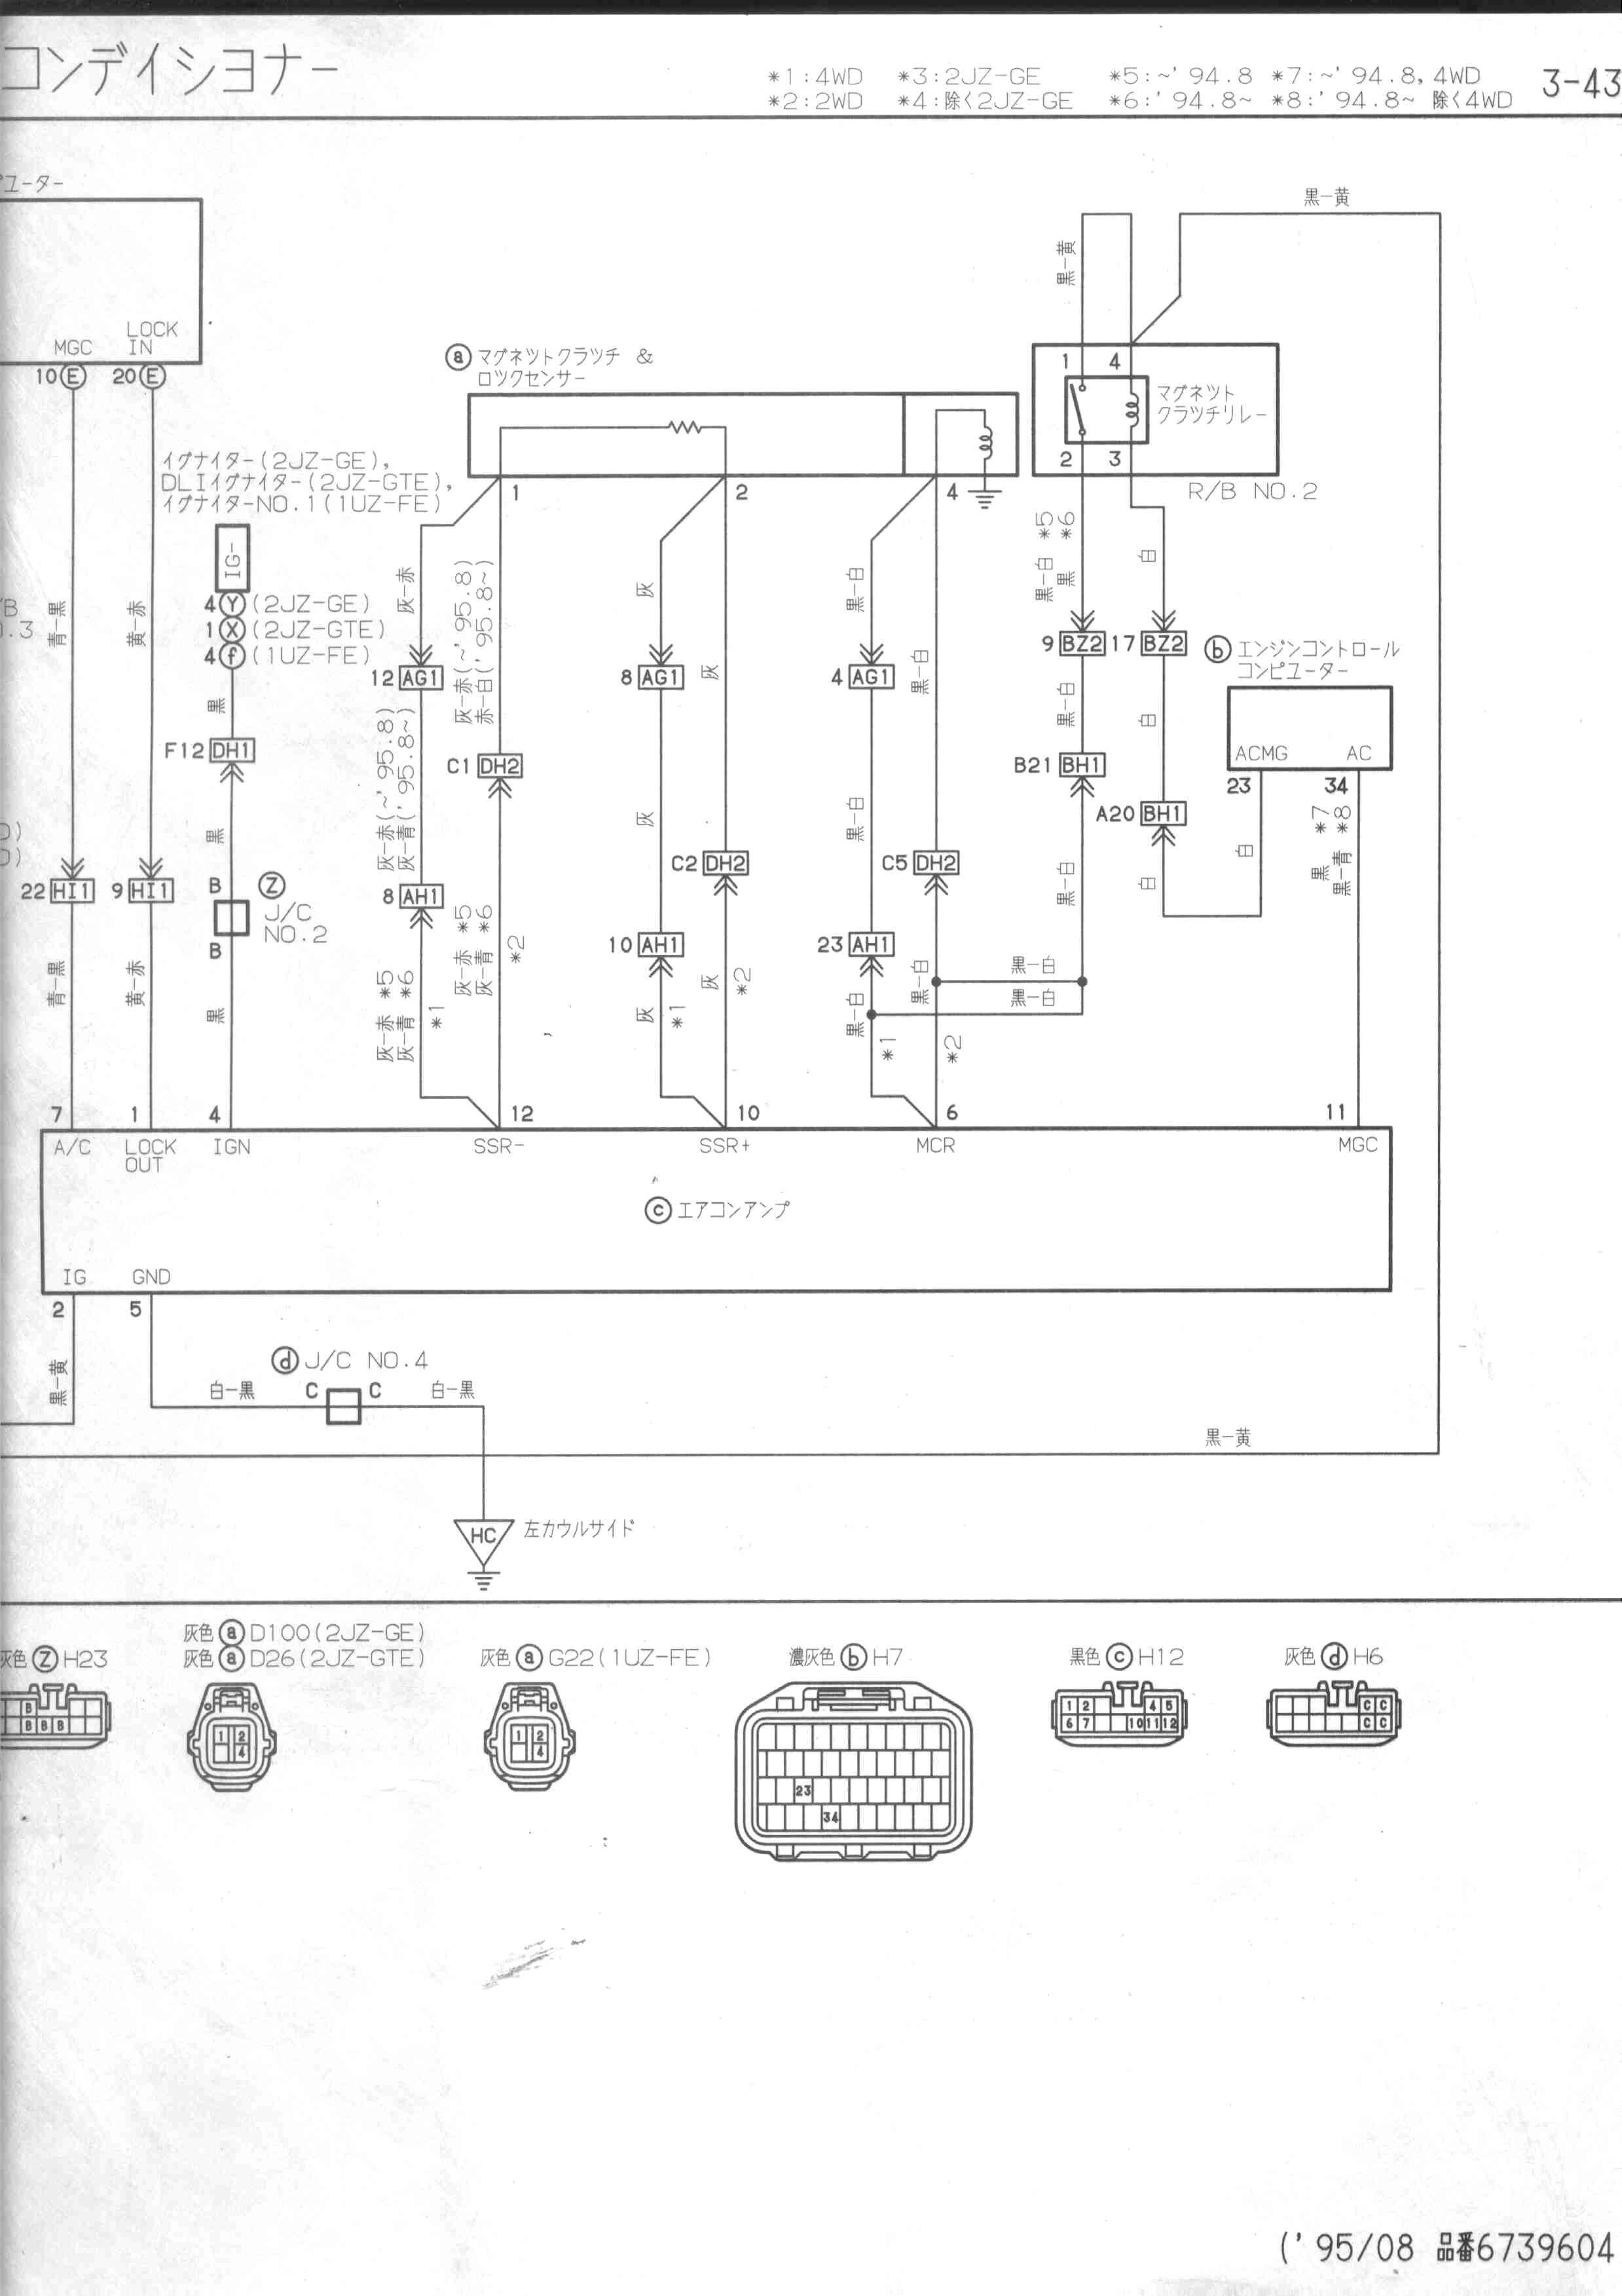 New Wiring Diagram Ac Sharp Inverter Diagram, Air